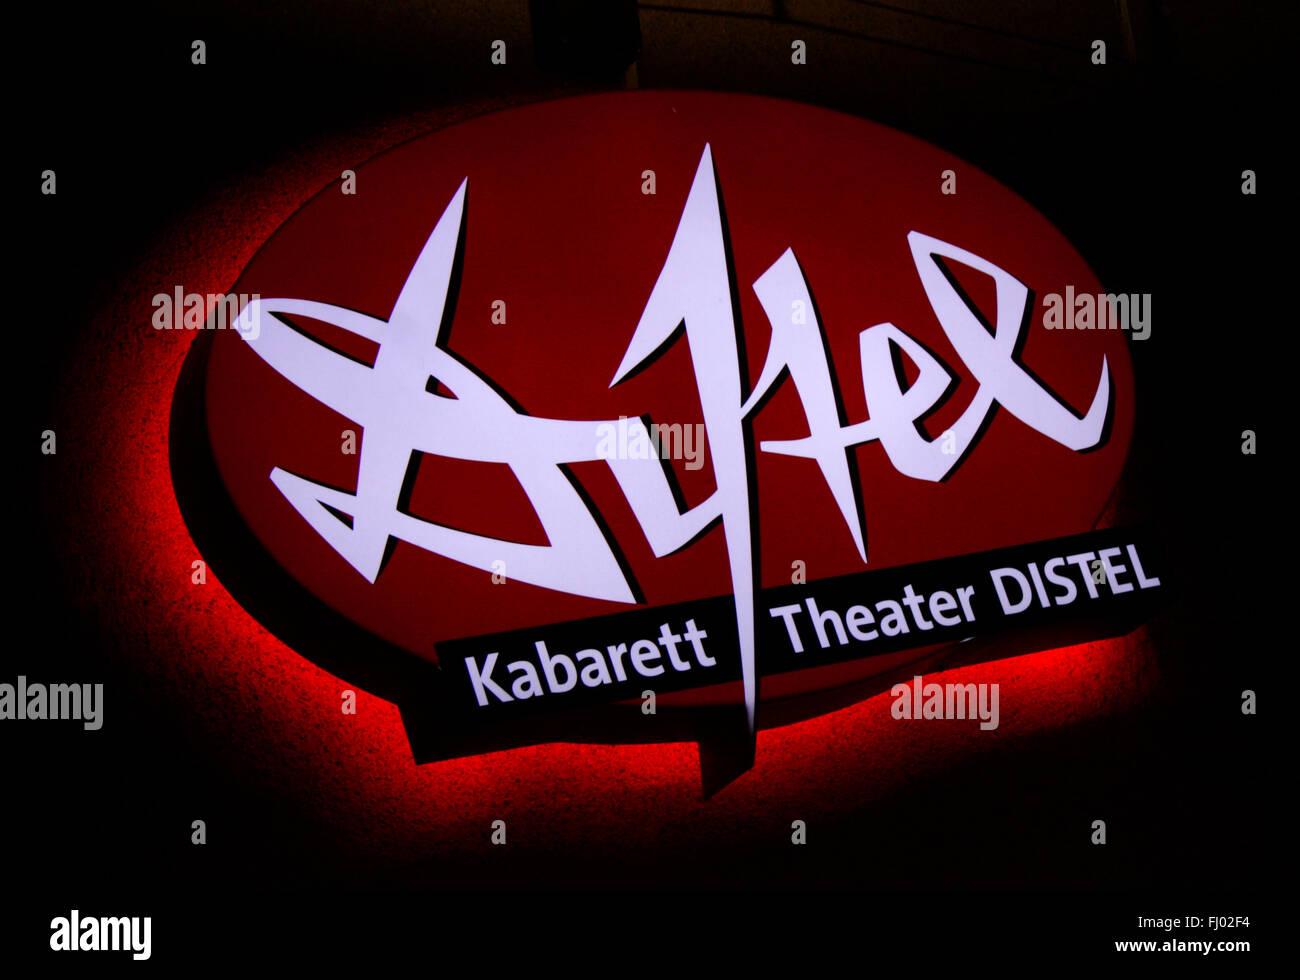 'Distel Kabarett Theater', Berlin. - Stock Image